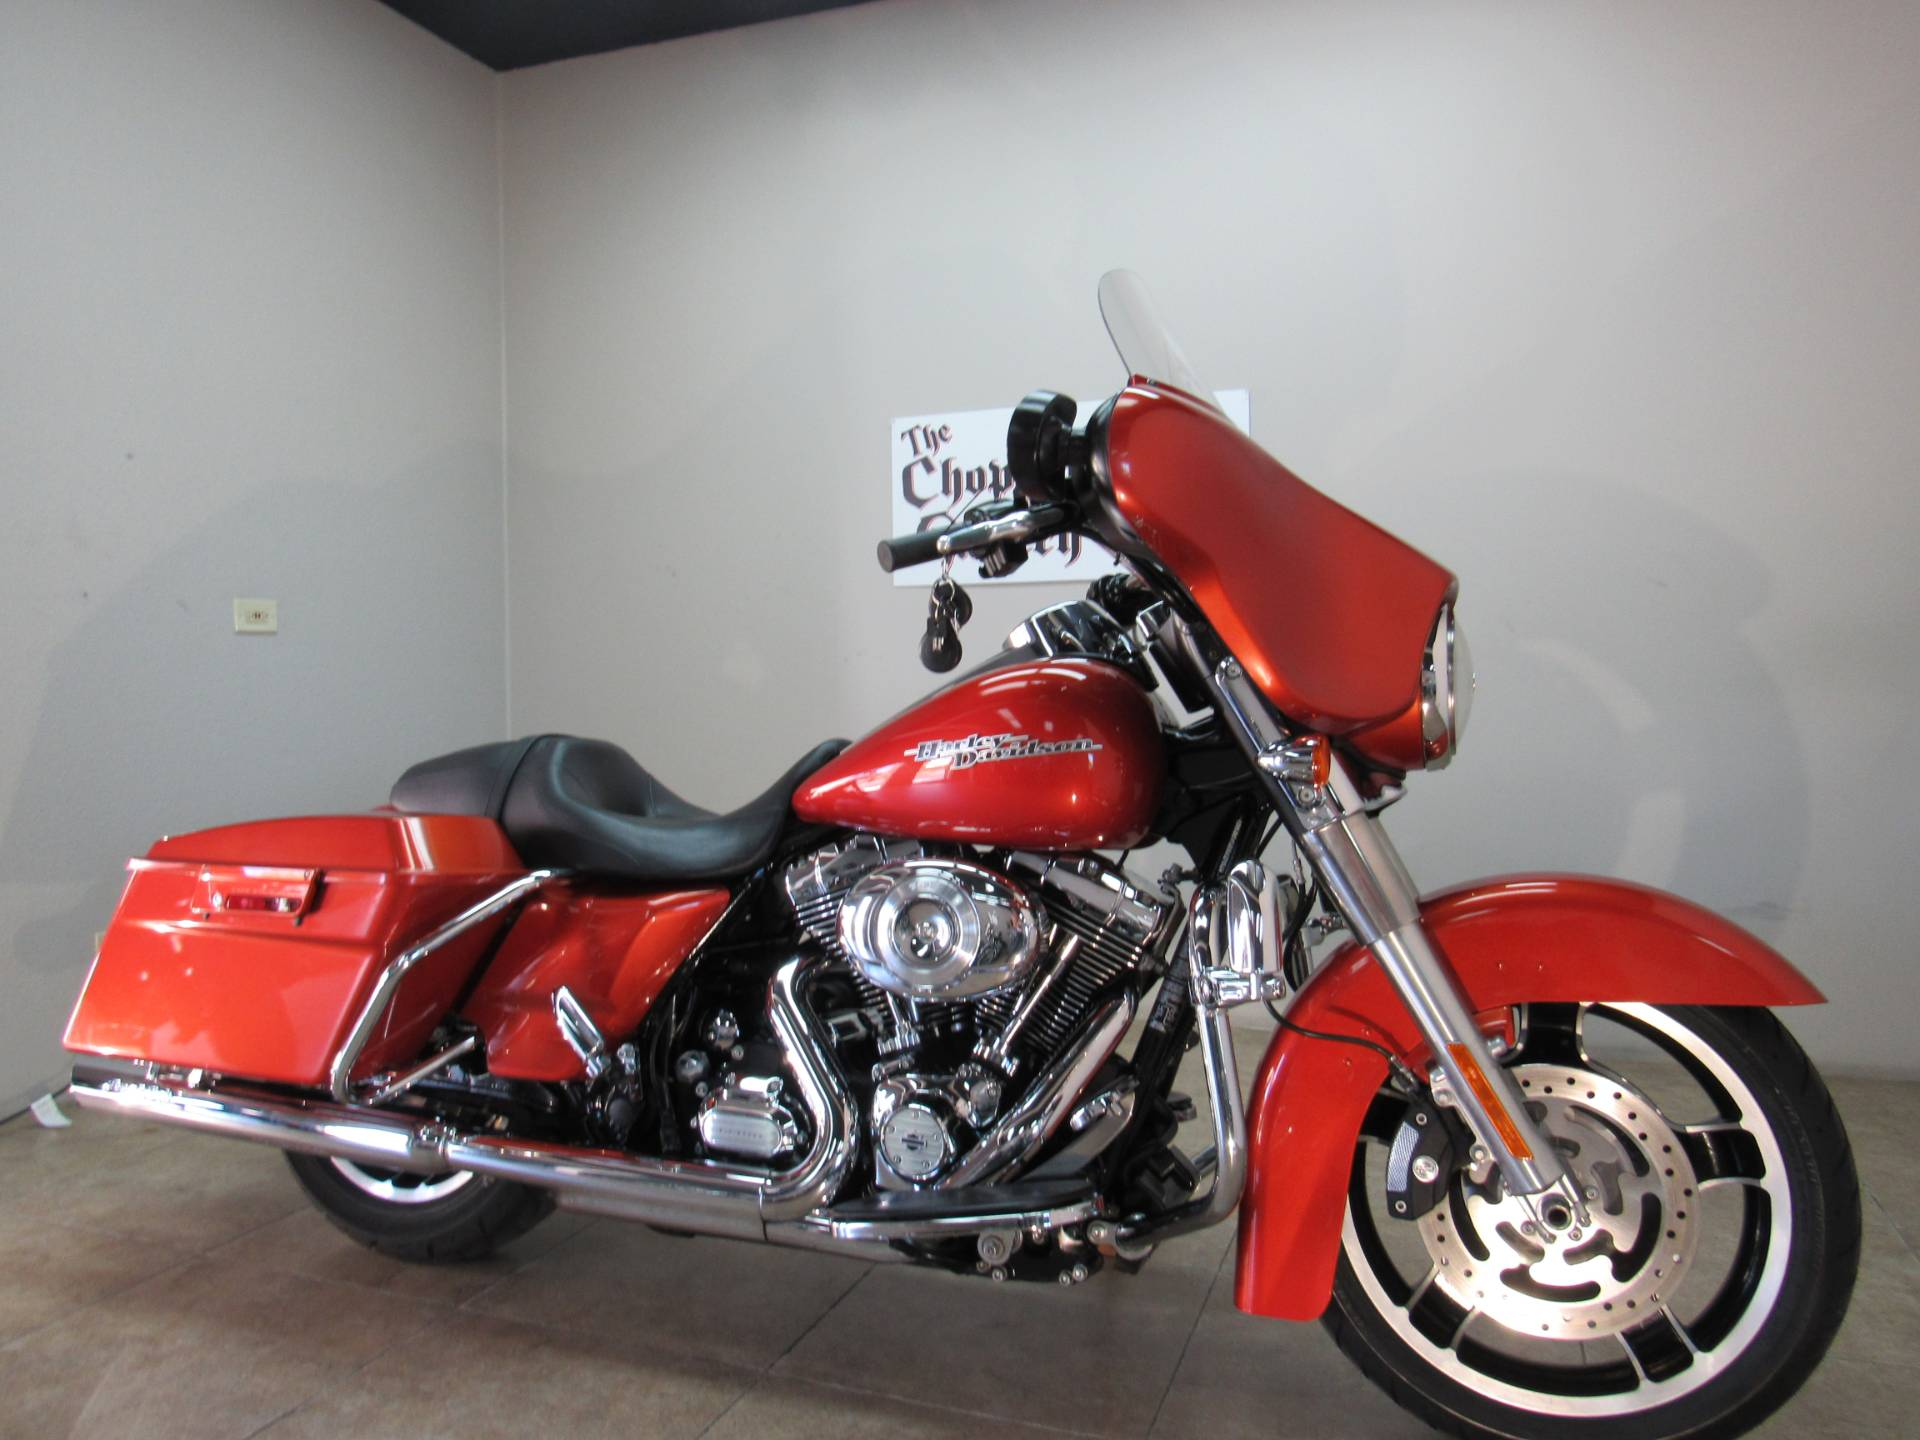 2011 Harley-Davidson Street Glide® in Temecula, California